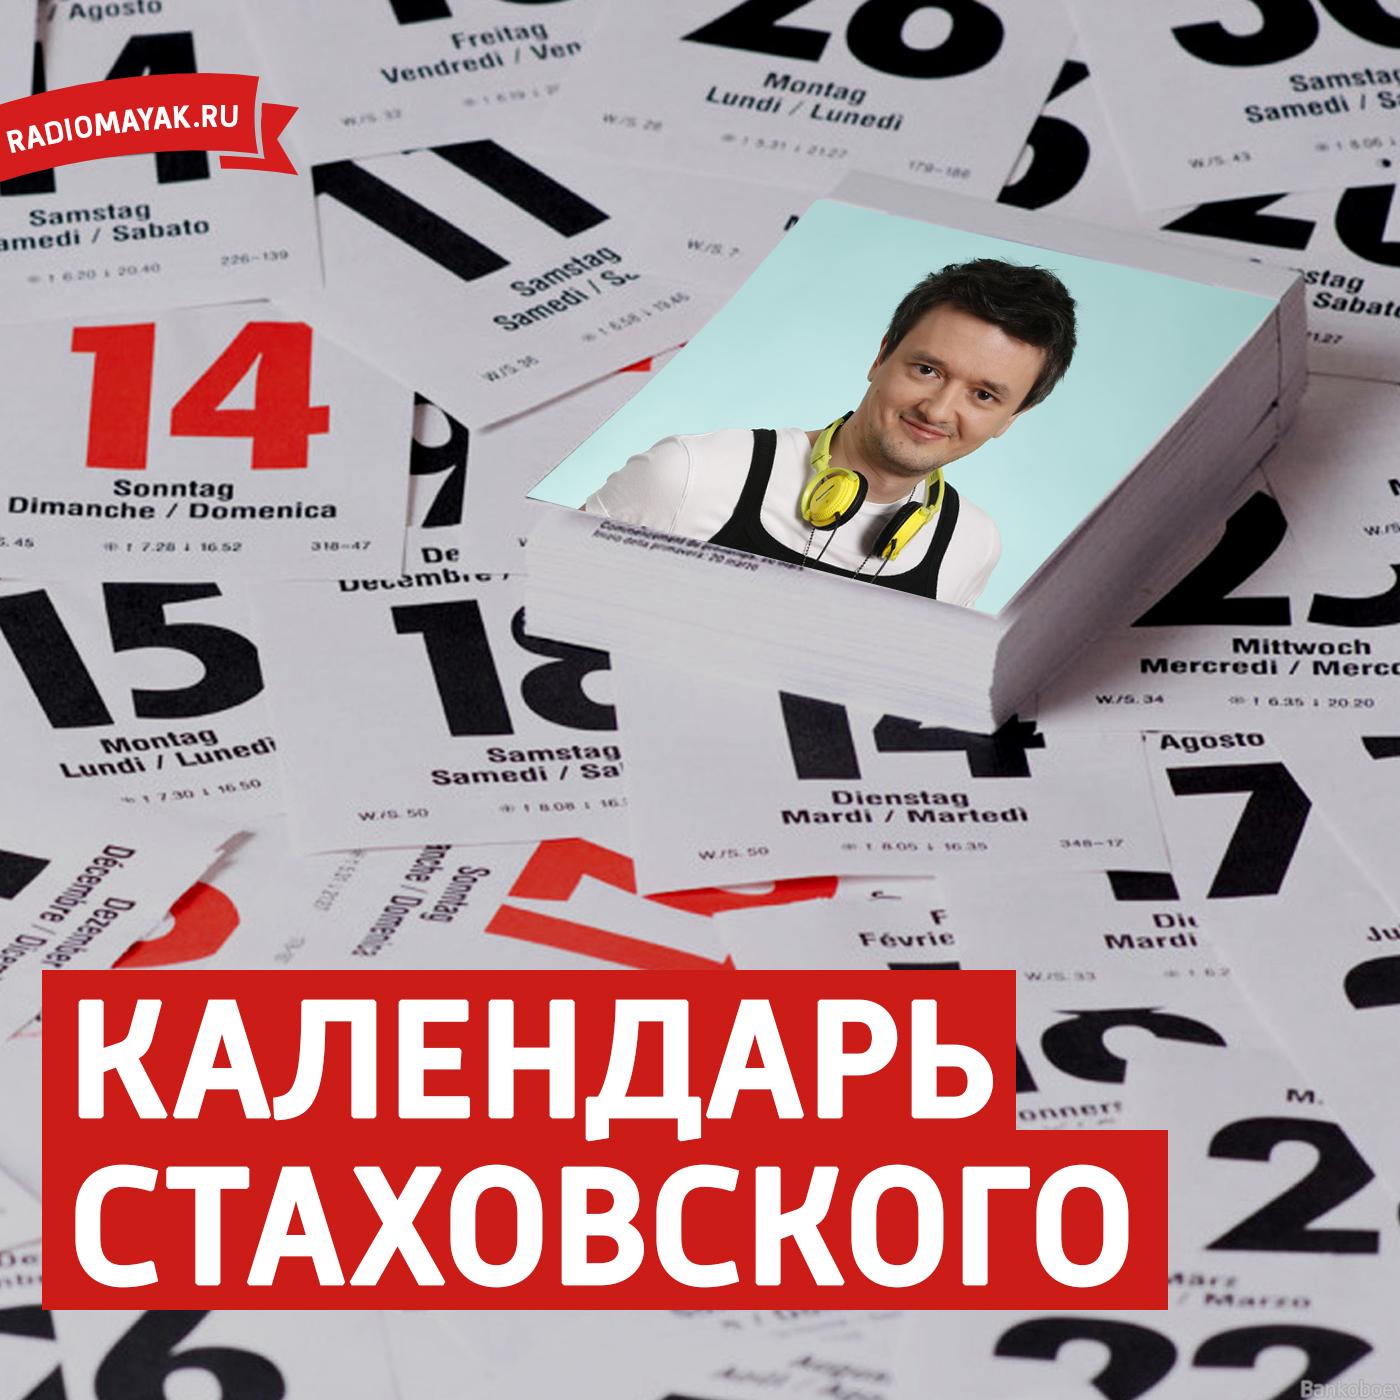 Календарь (Евгений Стаховский)